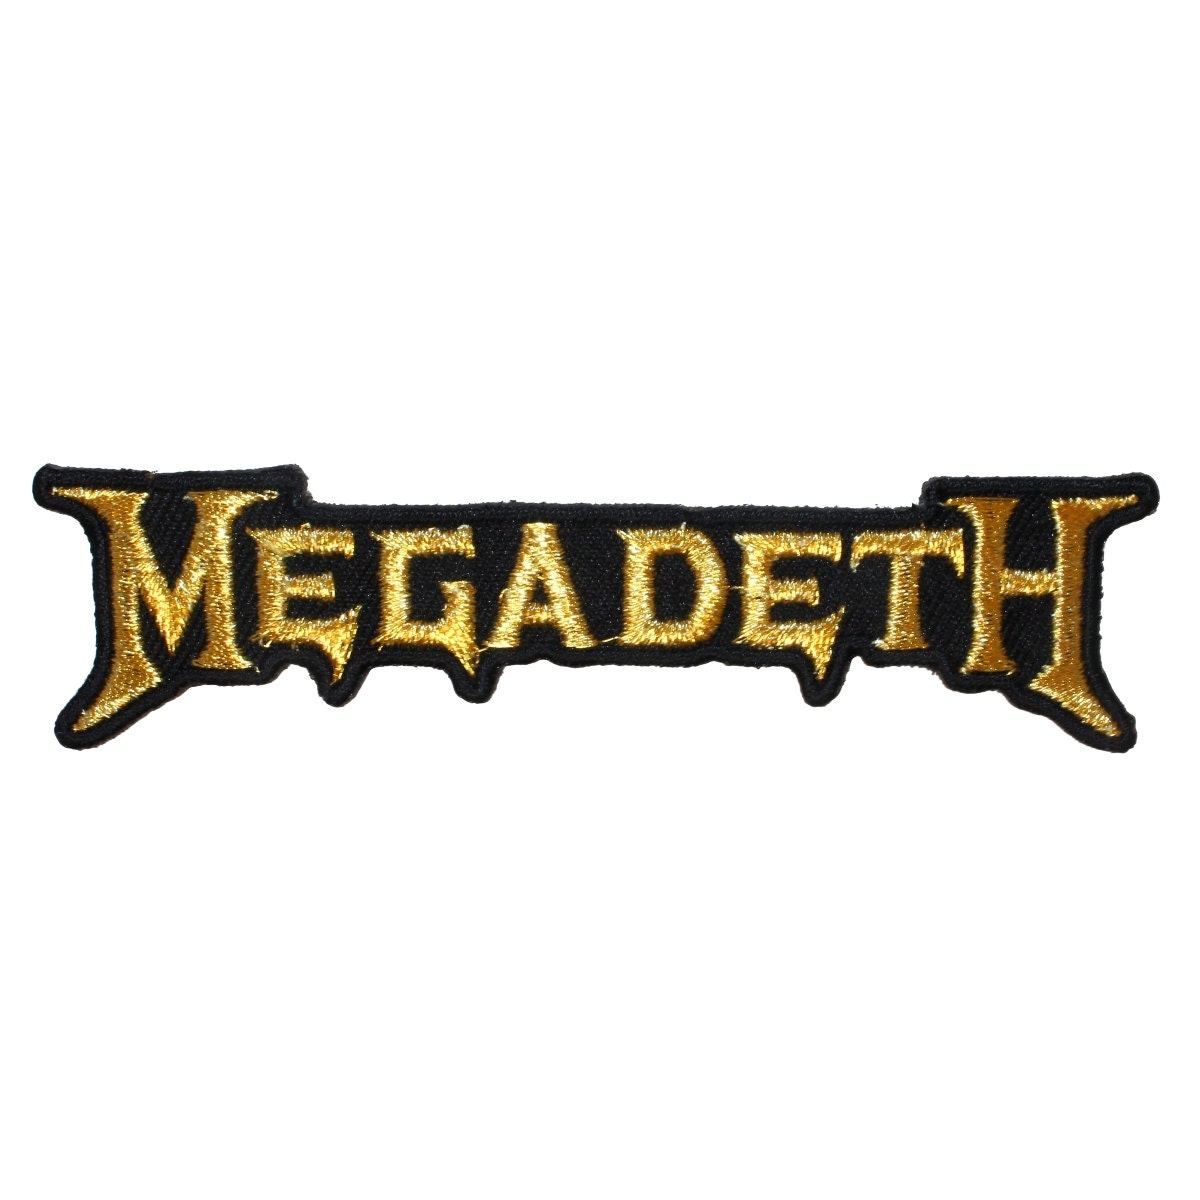 heavy metal music megadeth gold band logo rh etsy com Metal and Punk Band Logos Glam Metal Band Logos